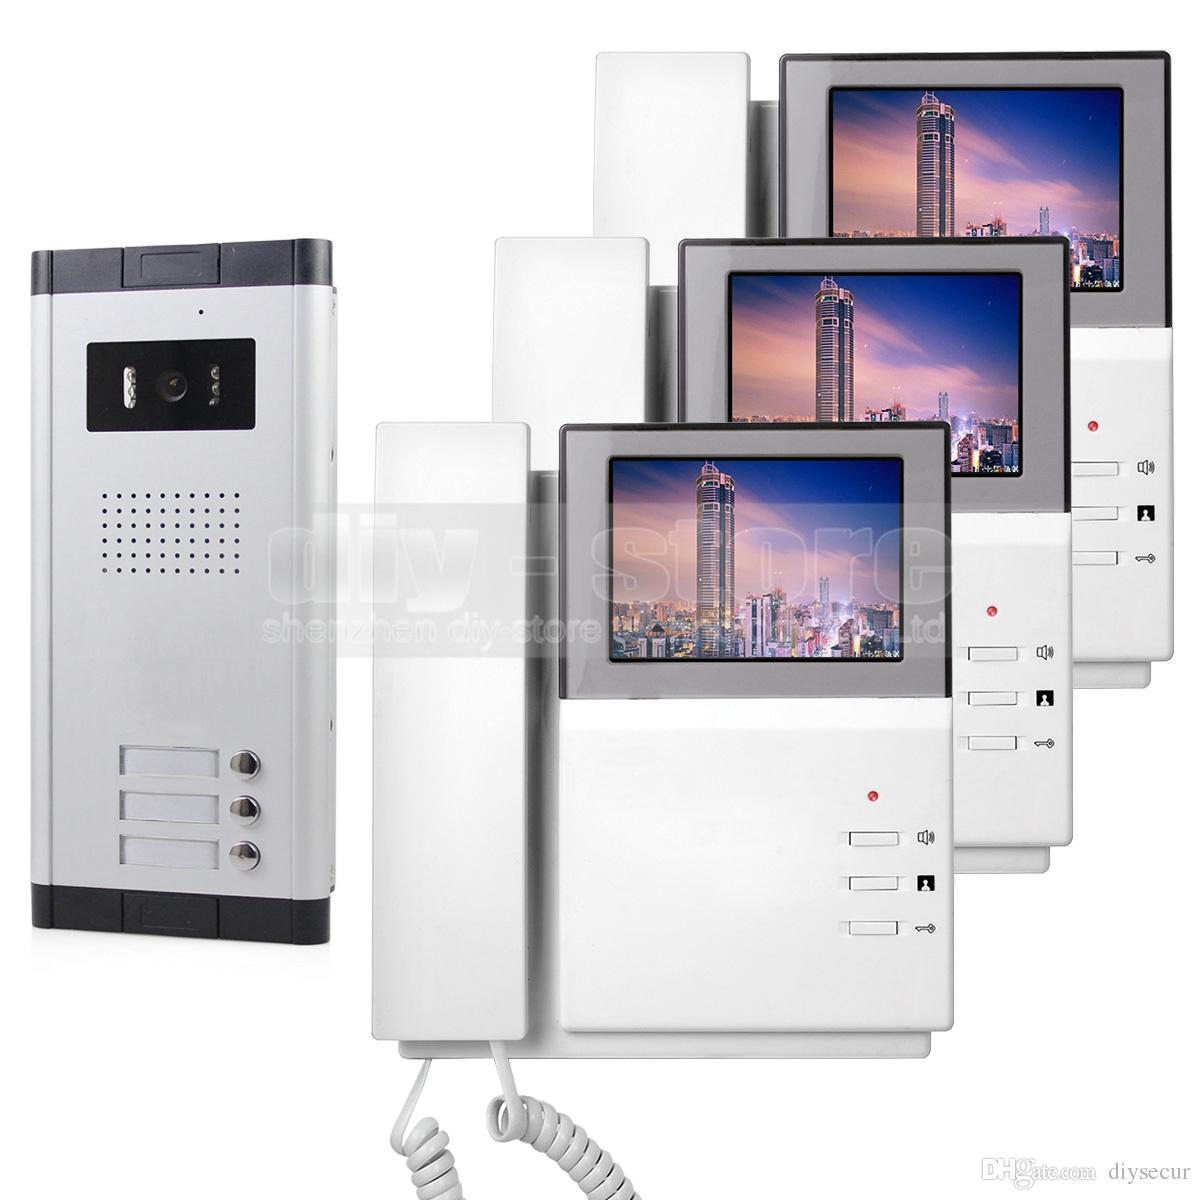 4.3 Hd Apartment Video Door Phone Video Intercom Doorbell System 700 Tvline Ir Camera Touch Key For 3 Families Cam Door Camera At Front Door From Diysecur ...